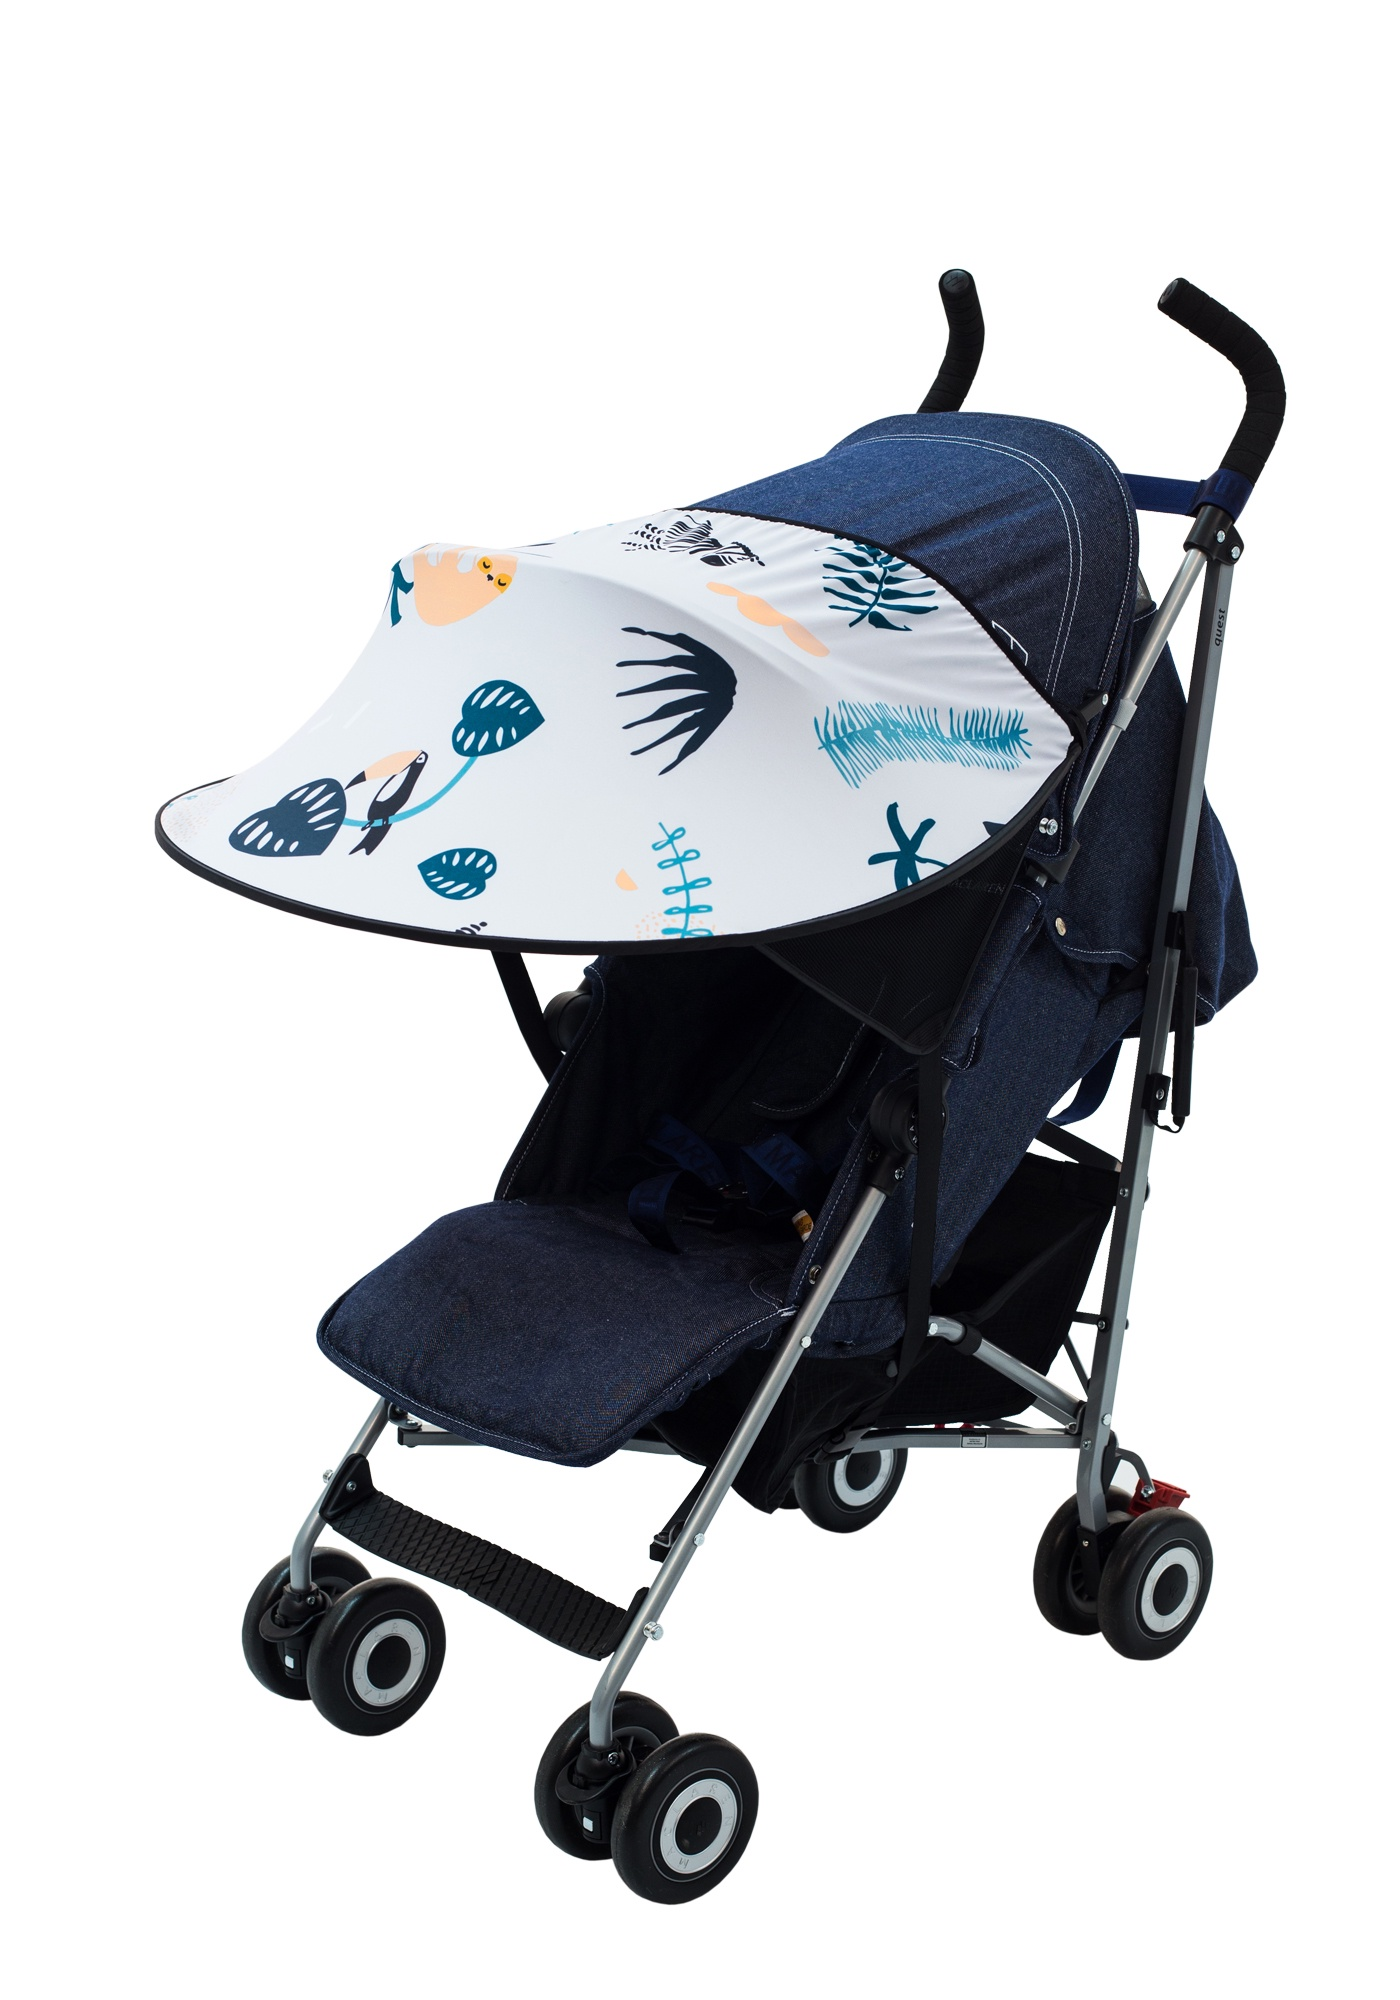 цена Аксессуар для колясок Leokid 5674 светло-бежевый, оранжевый онлайн в 2017 году